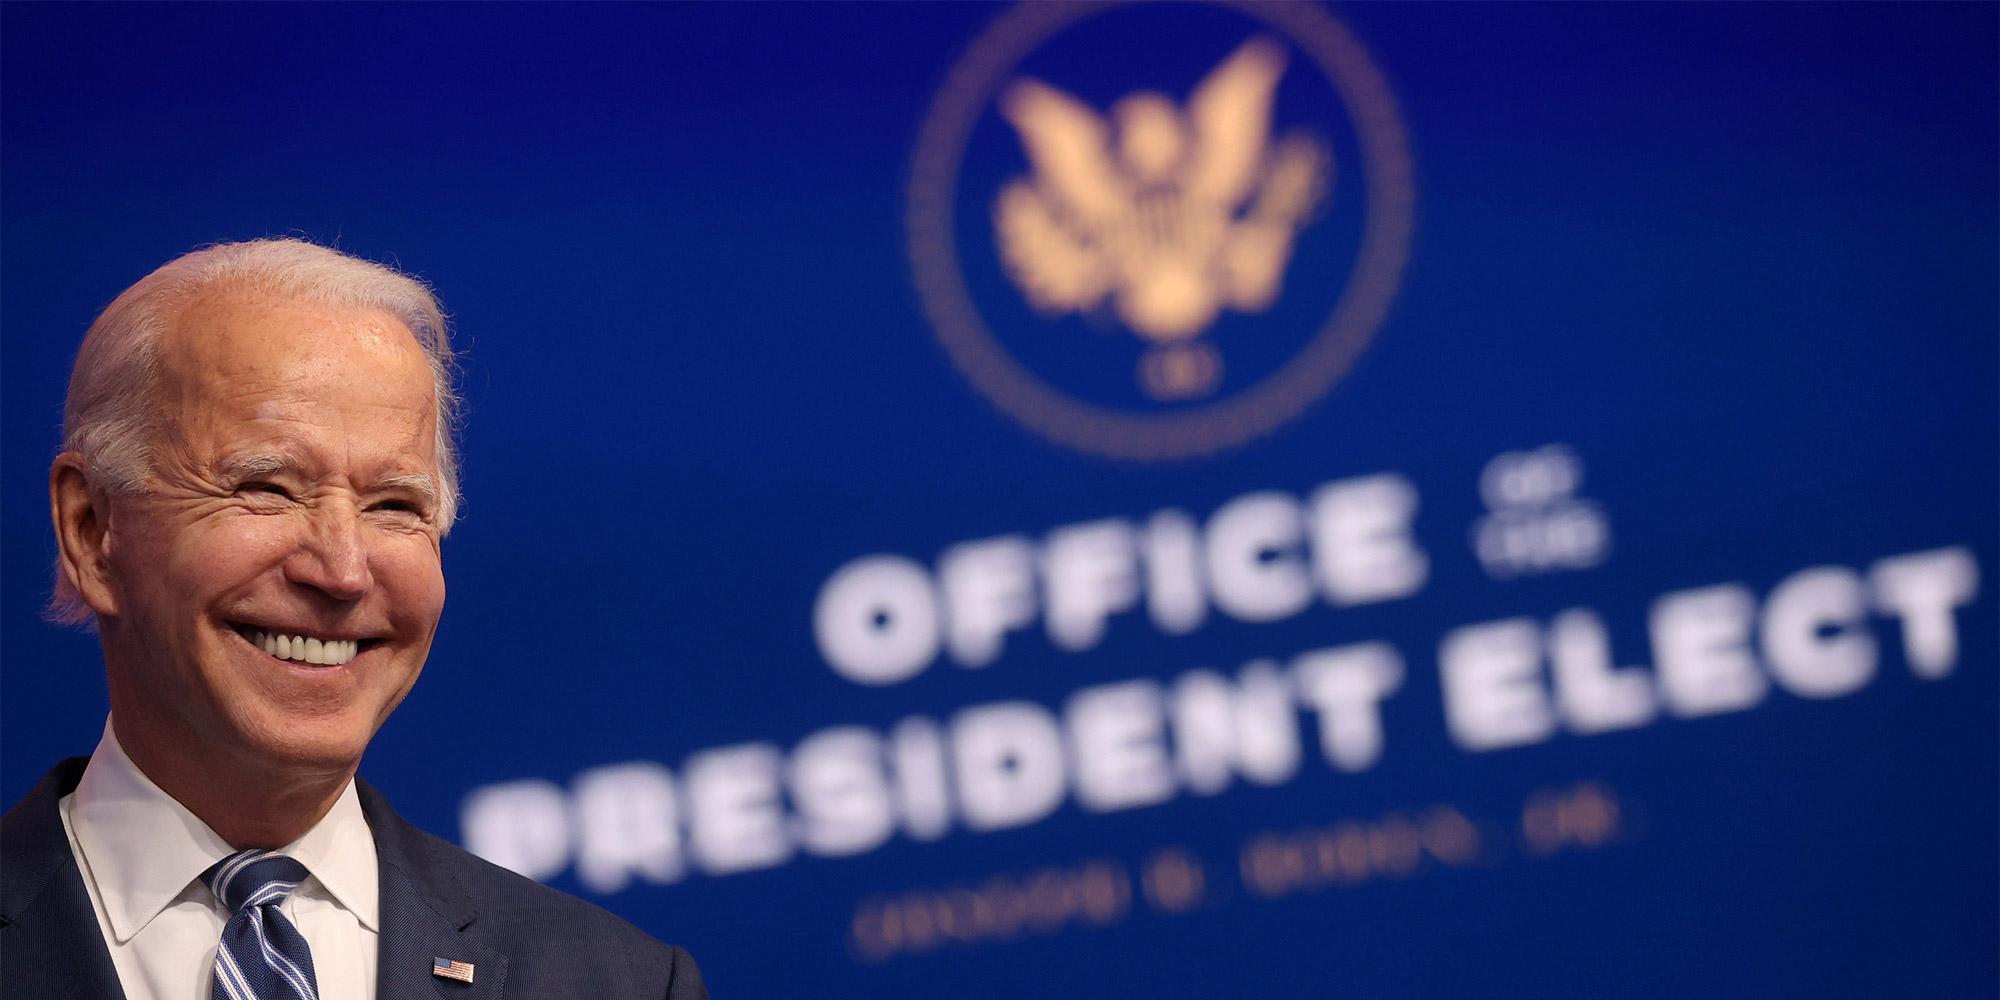 Presidentielle-americaine-le-decompte-definitif-conforte-la-victoire-du-democrate-Joe-Biden